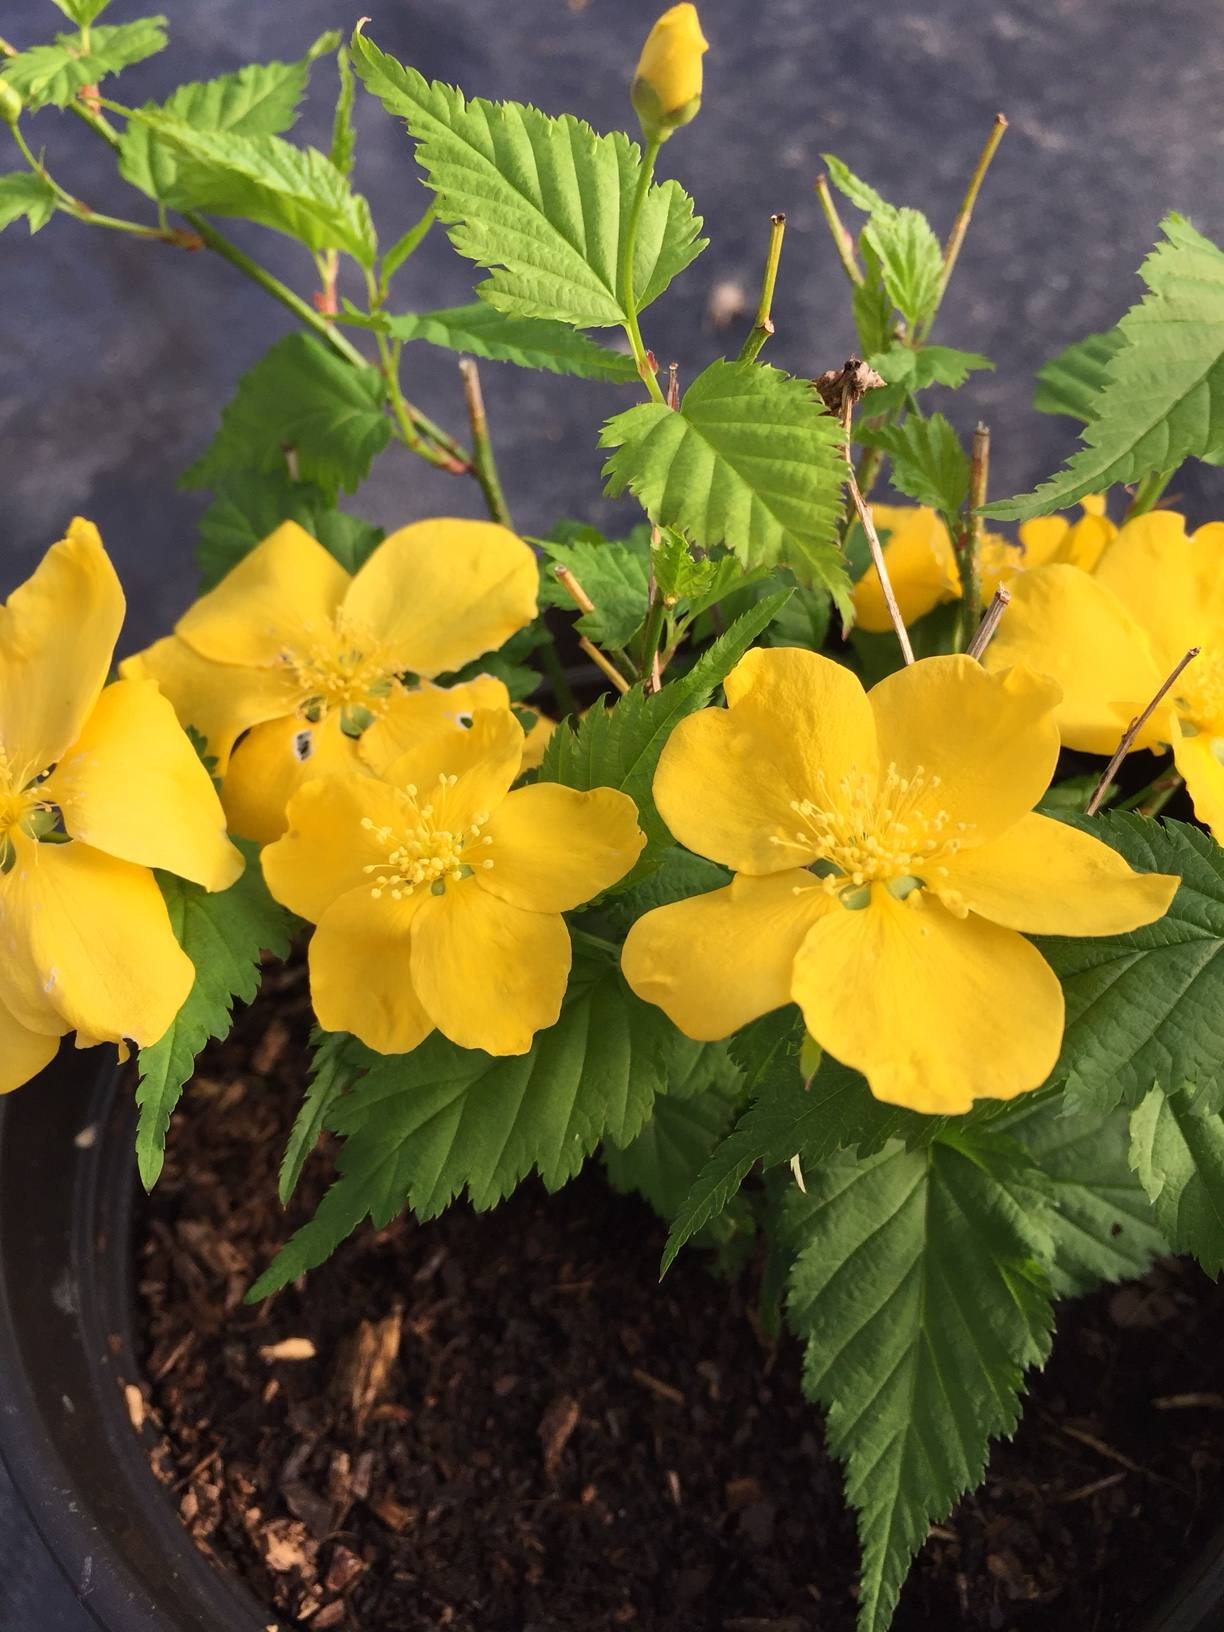 Penlan Perennials Nursery: Kerria Japonica 'Golden Guinea'